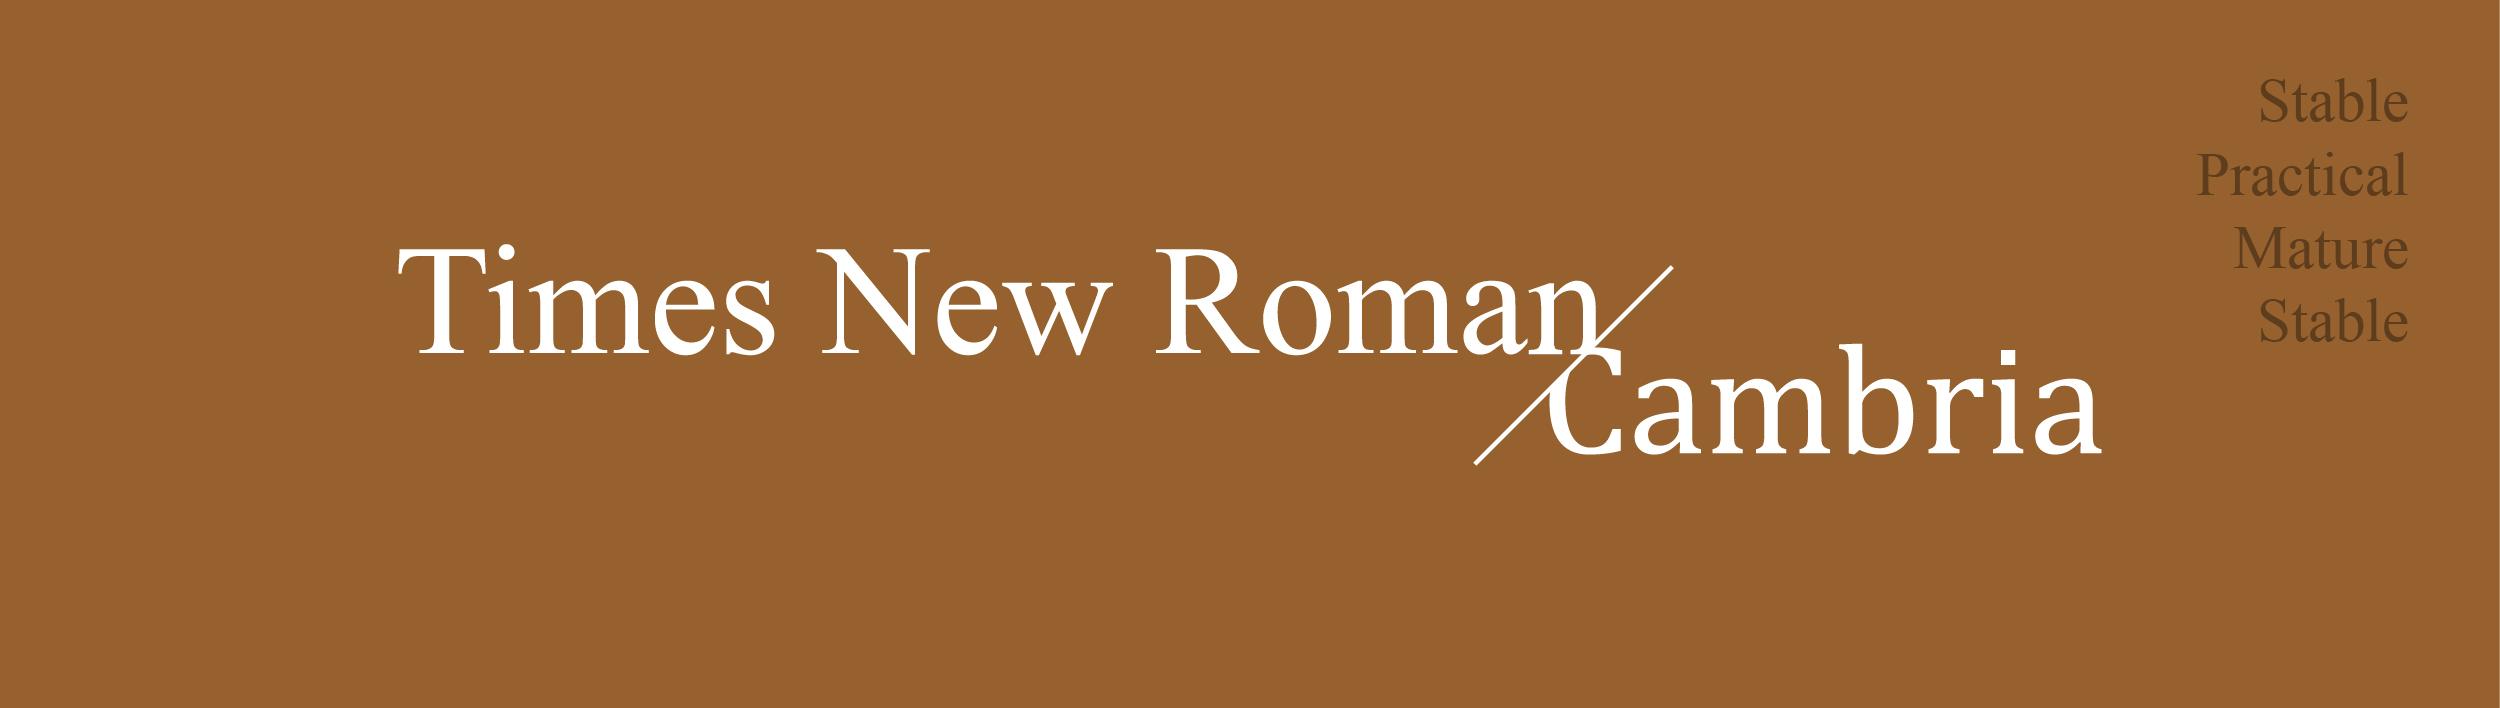 font times new roman cambria